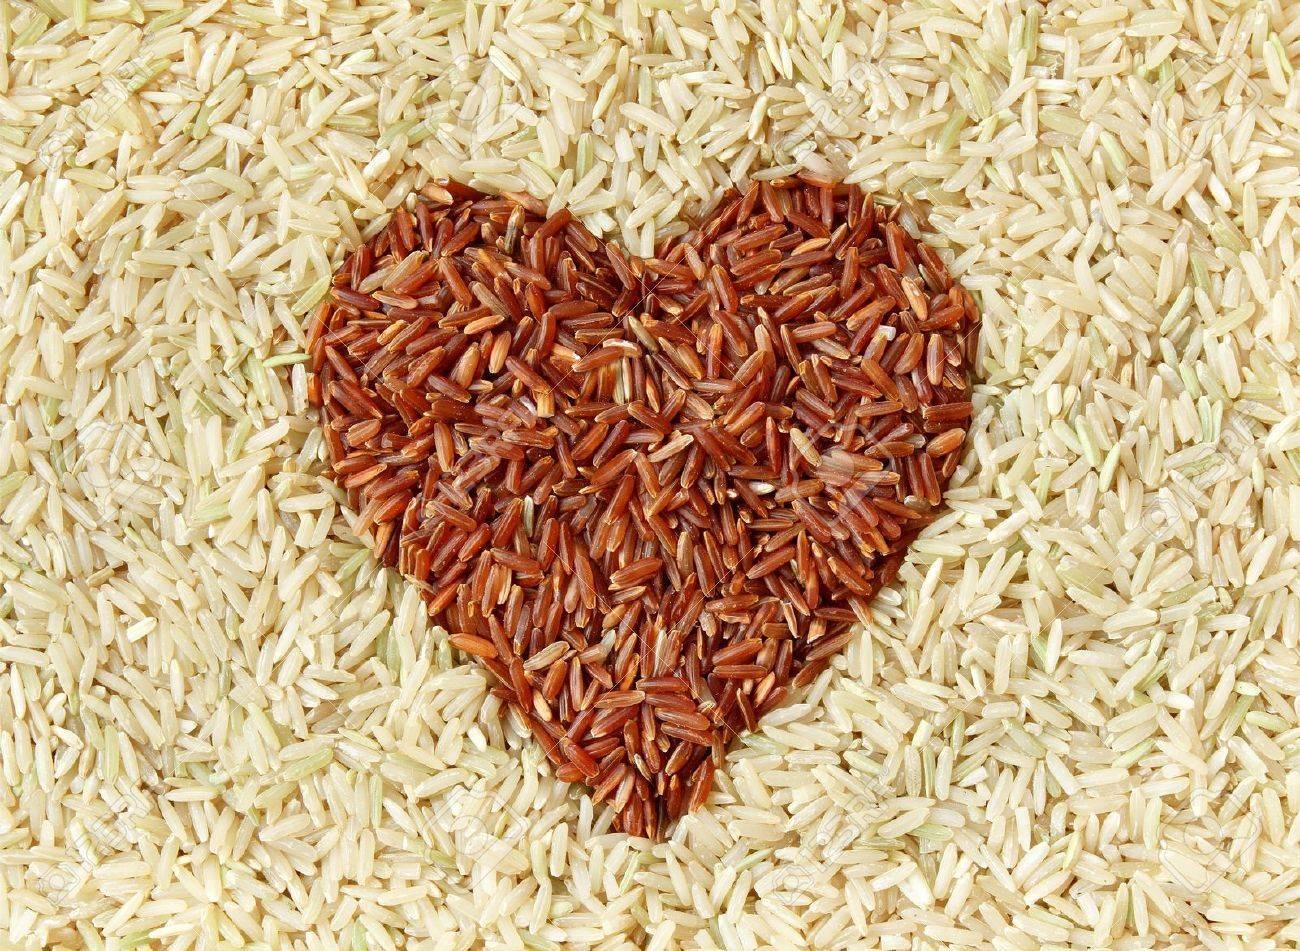 Польза, вред и рецепты из бурого риса